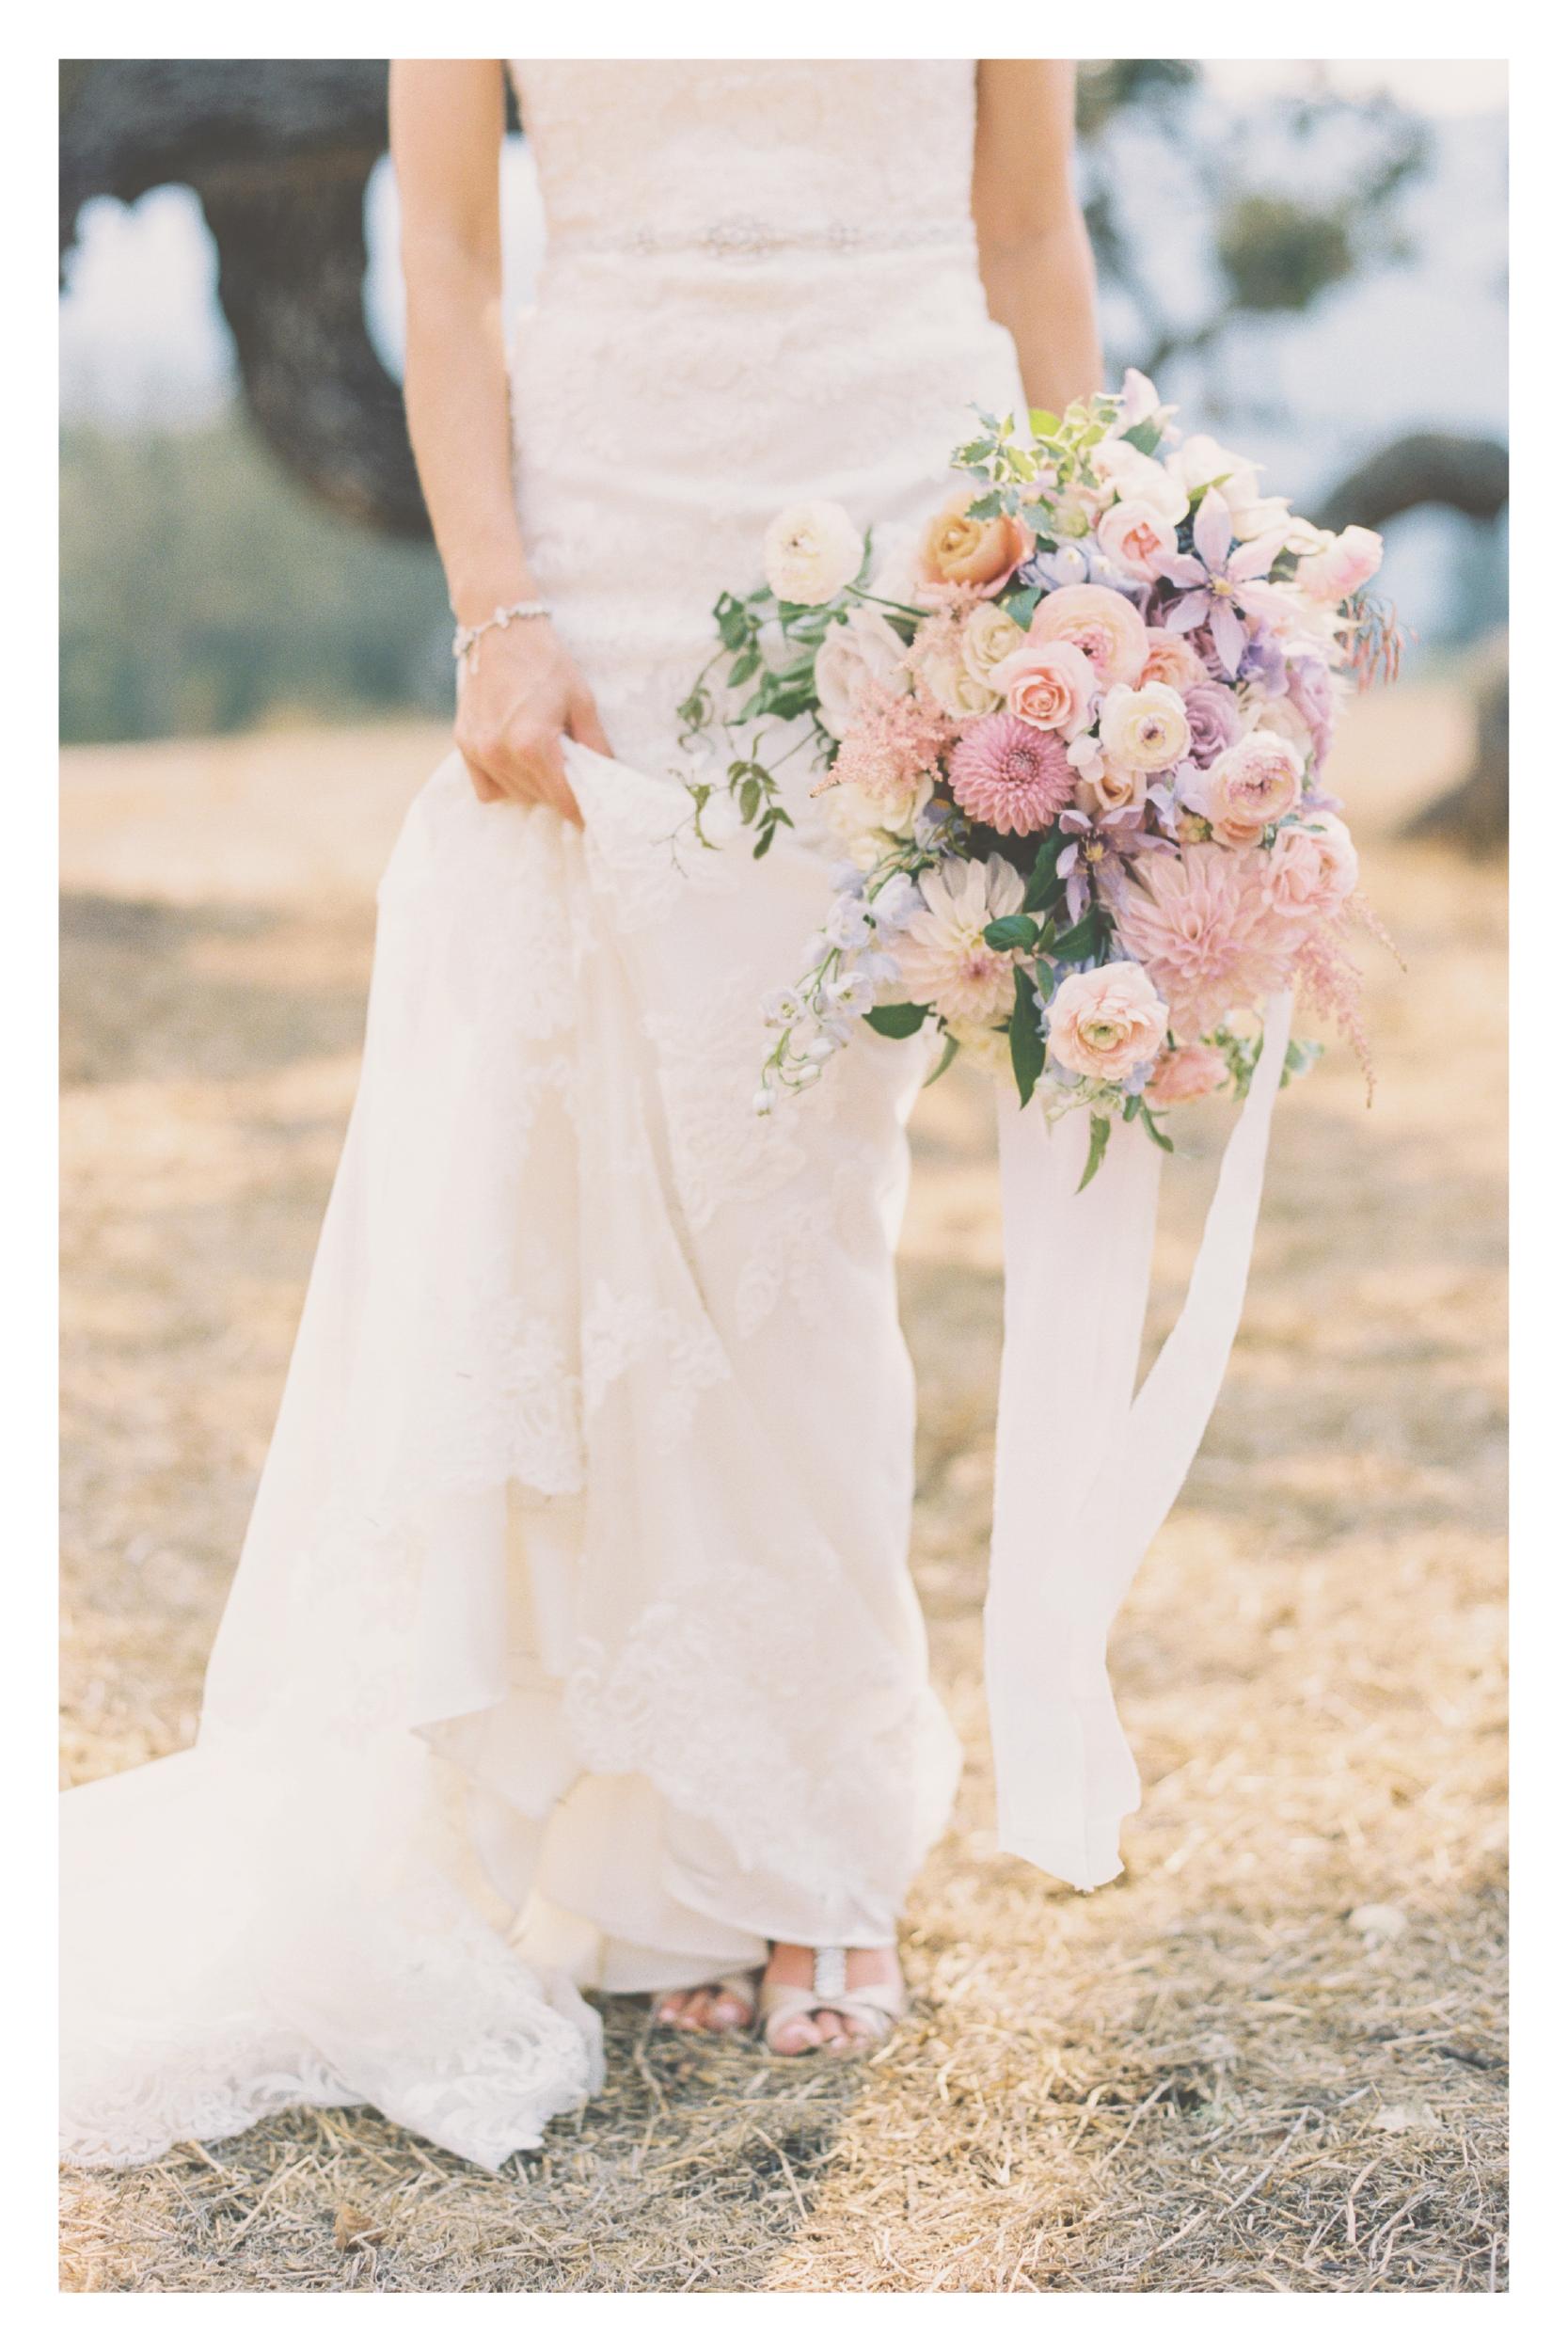 Michaela & McCann - Wedding